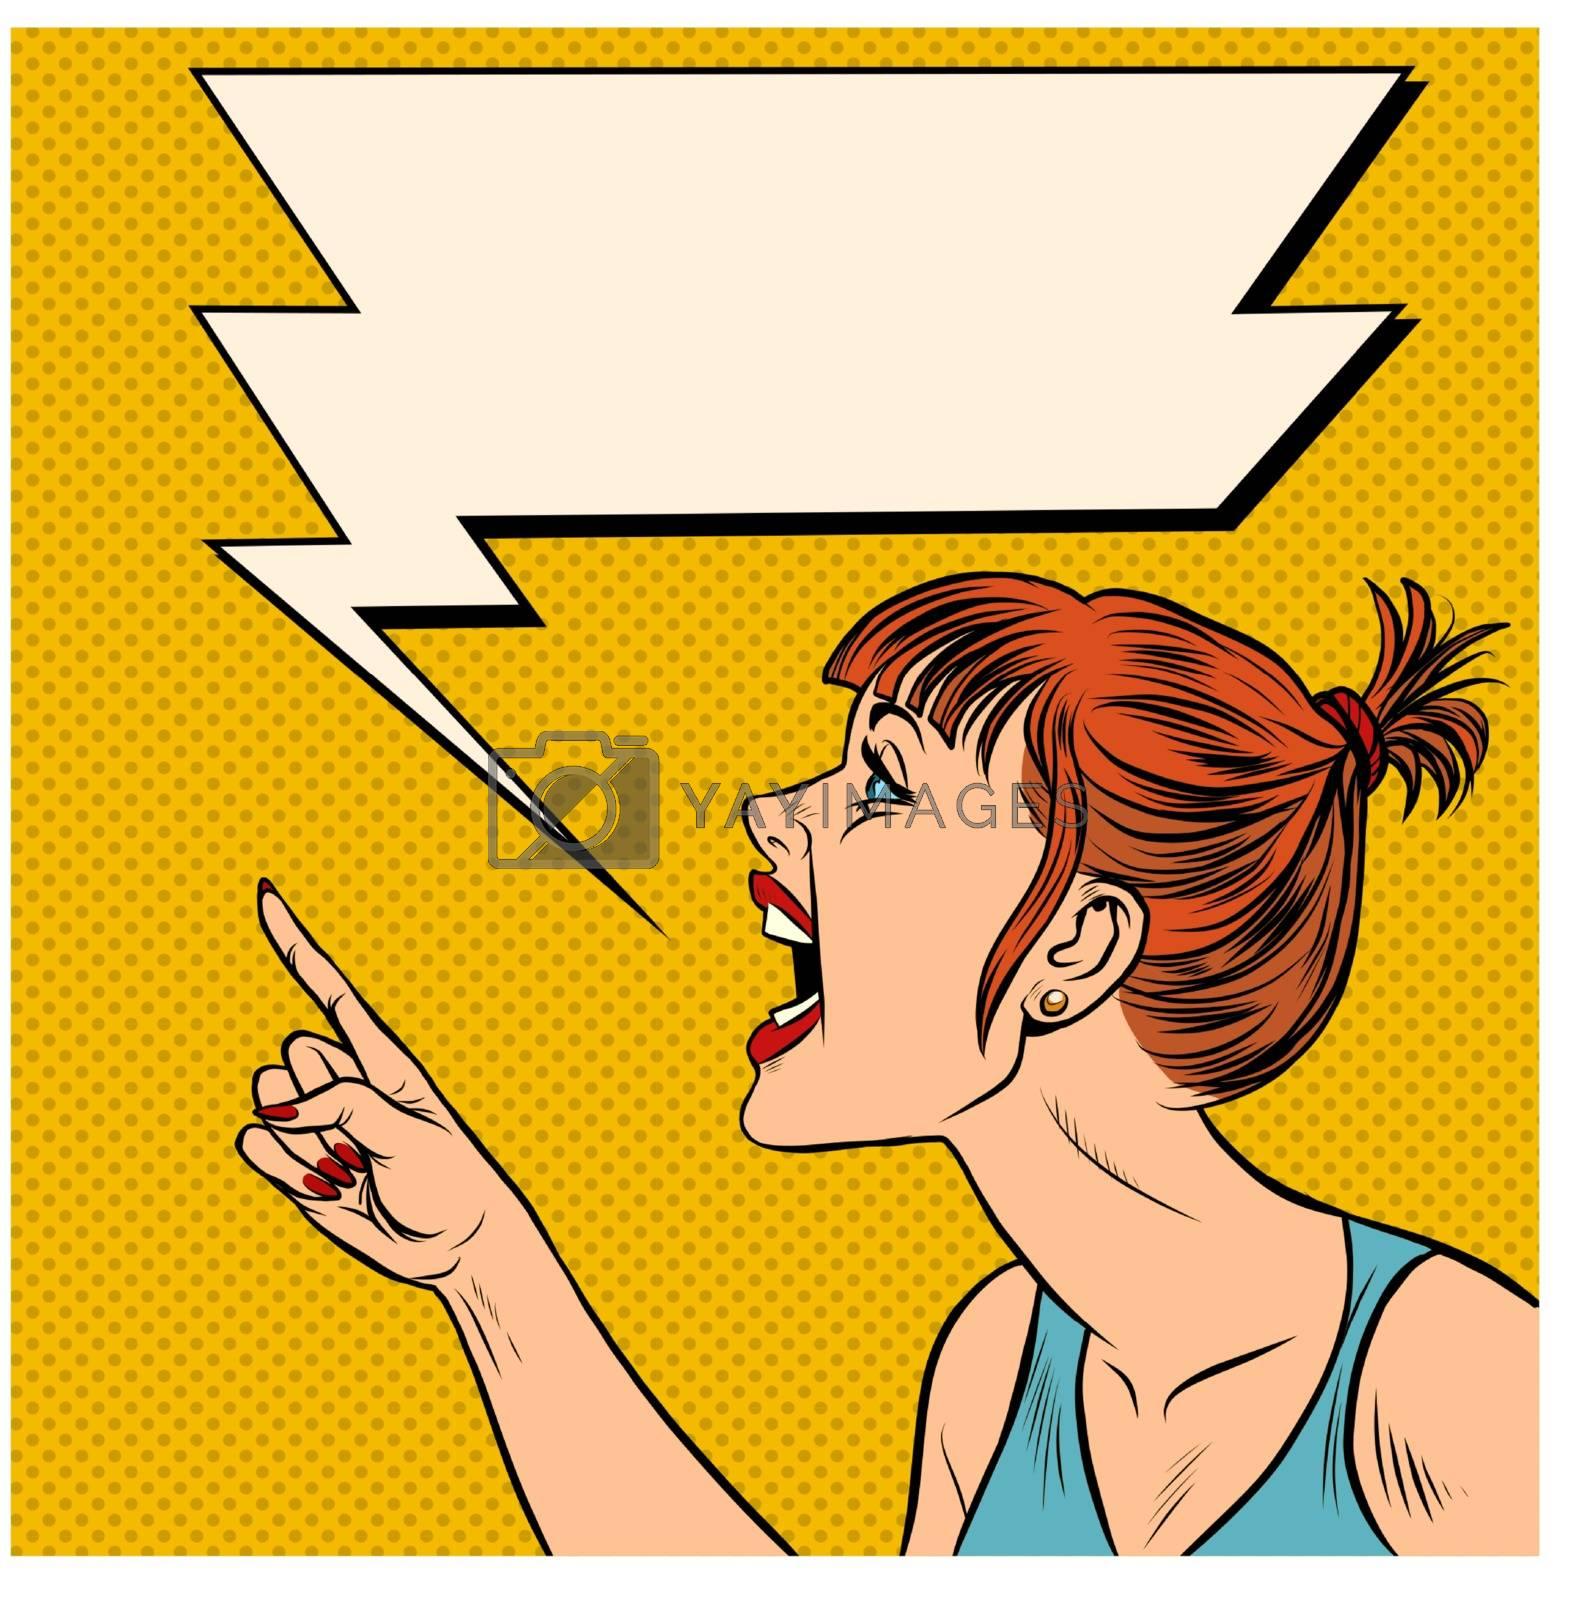 Angry woman threatens finger. Pop art retro vector illustration kitsch vintage 50s 60s